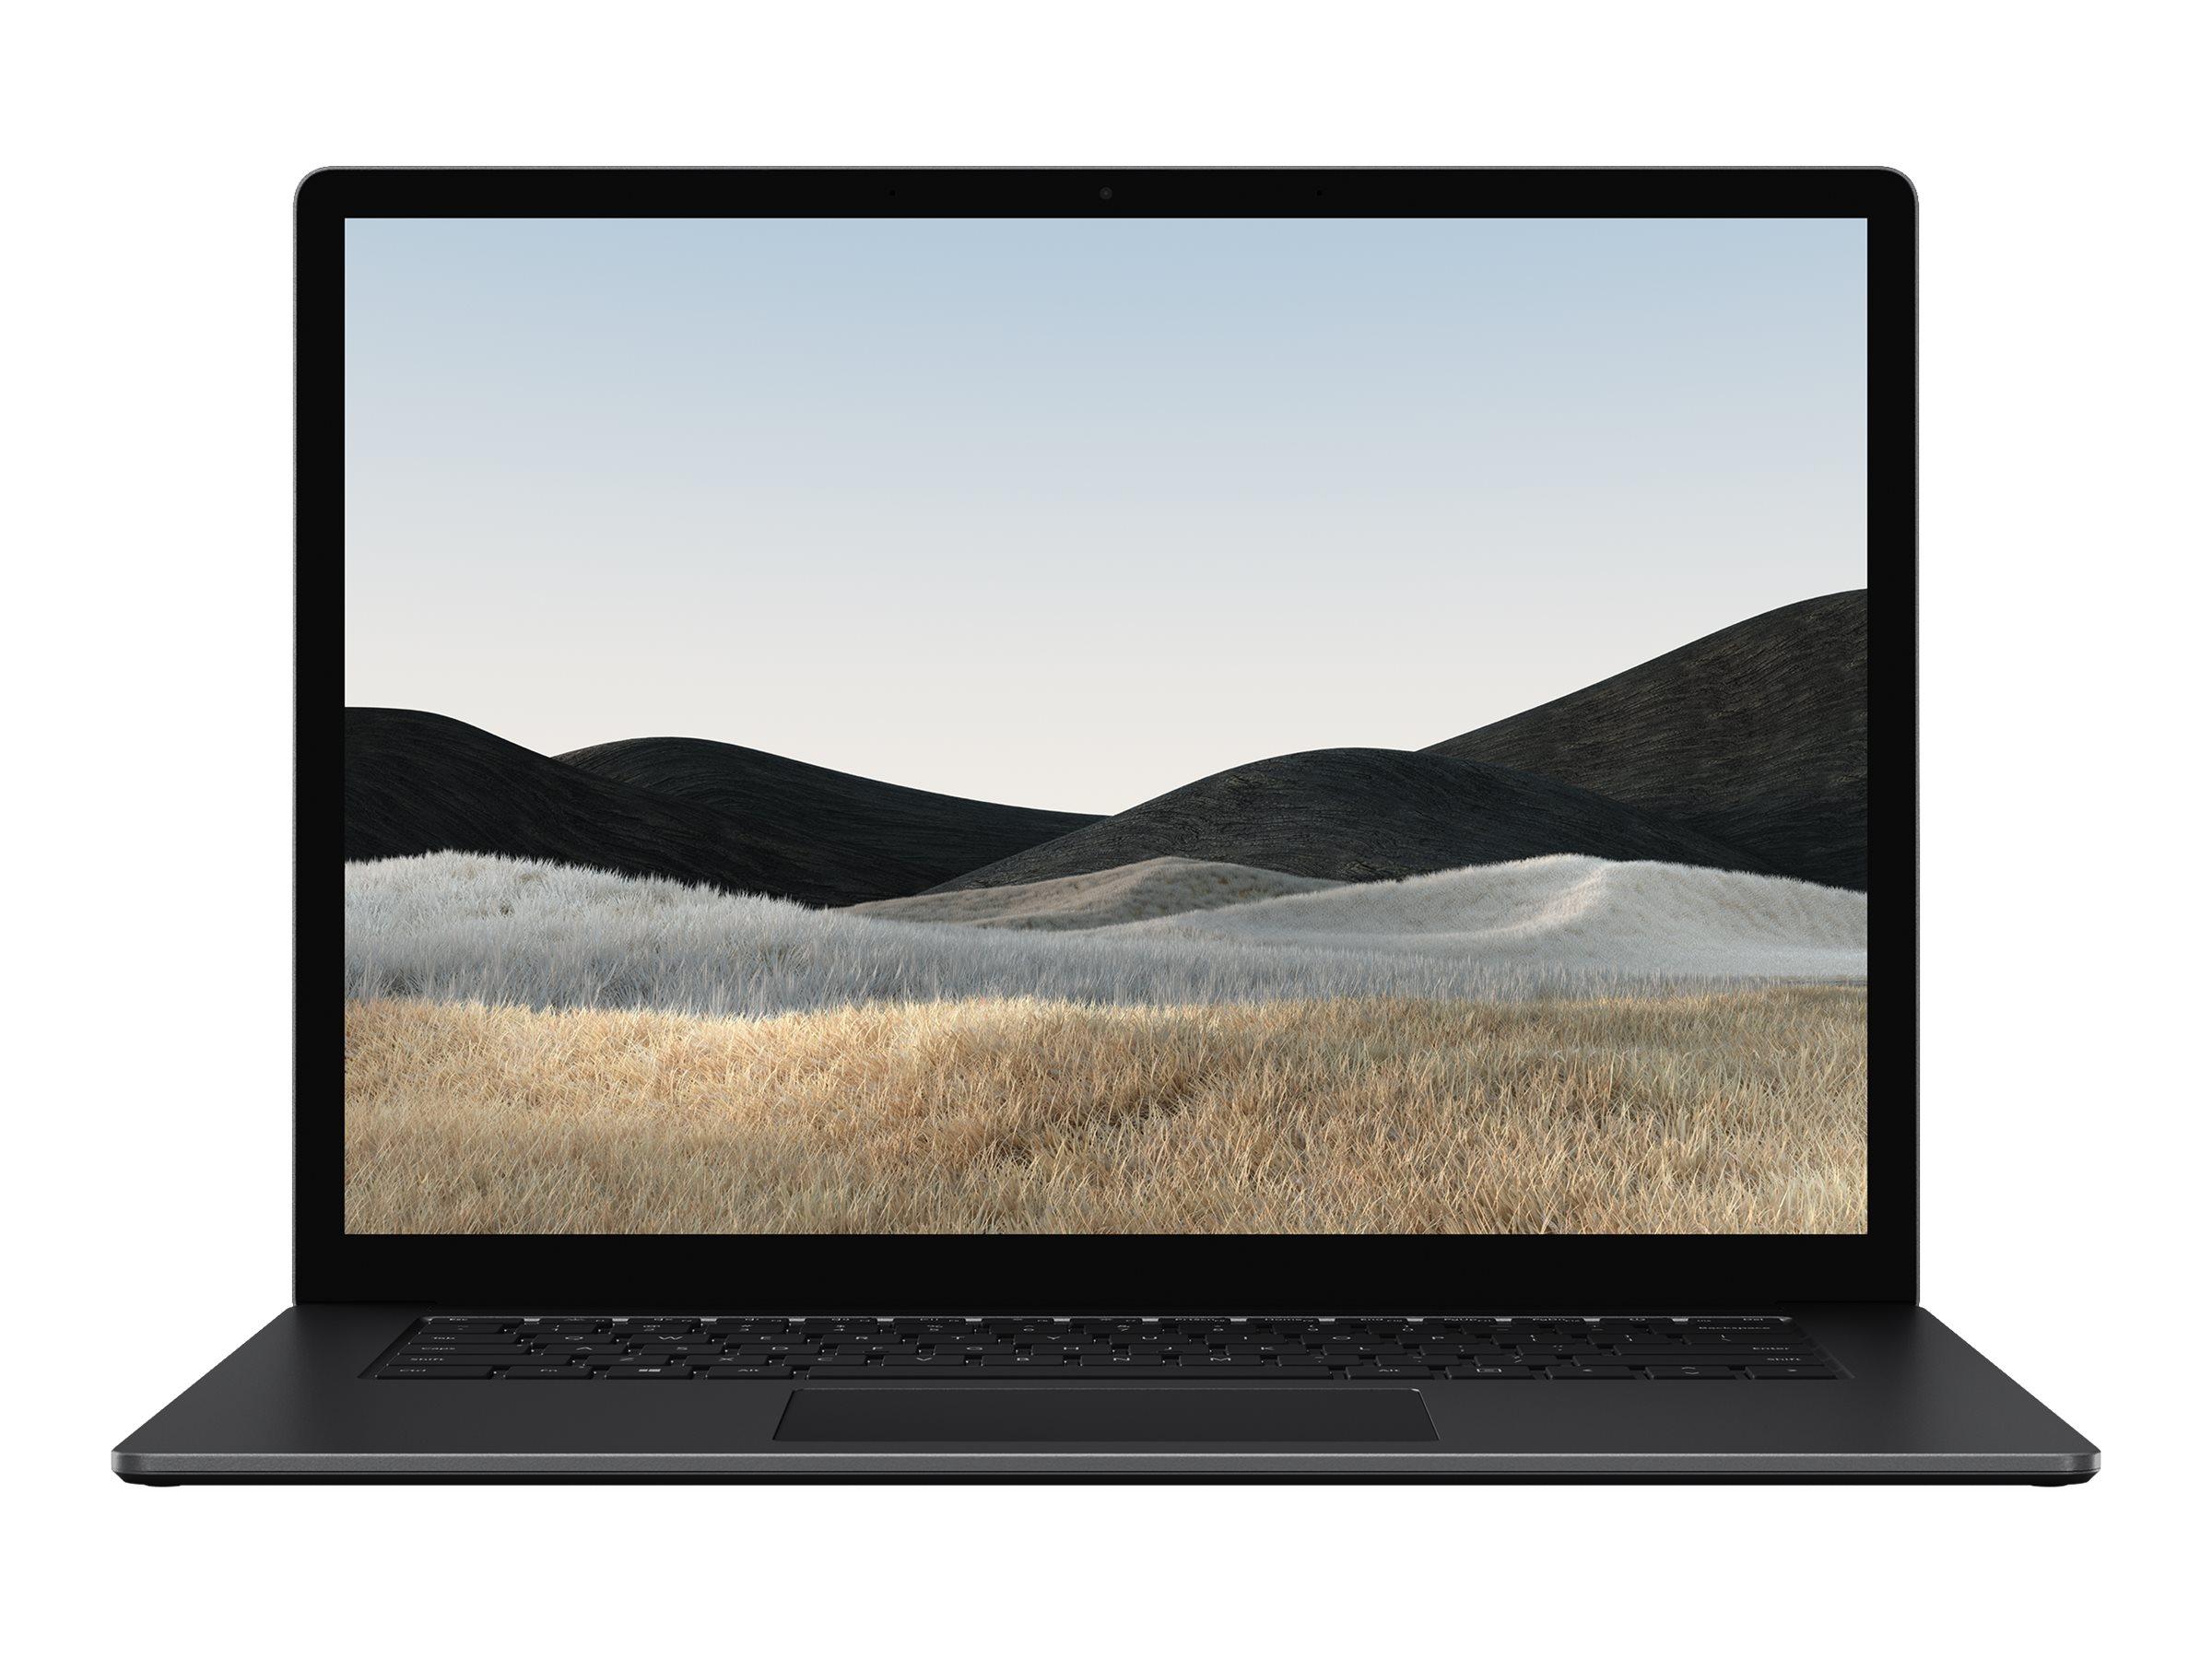 Microsoft Surface Laptop 4 - Core i5 1145G7 - Win 10 Pro - 8 GB RAM - 256 GB SSD - 34.3 cm (13.5